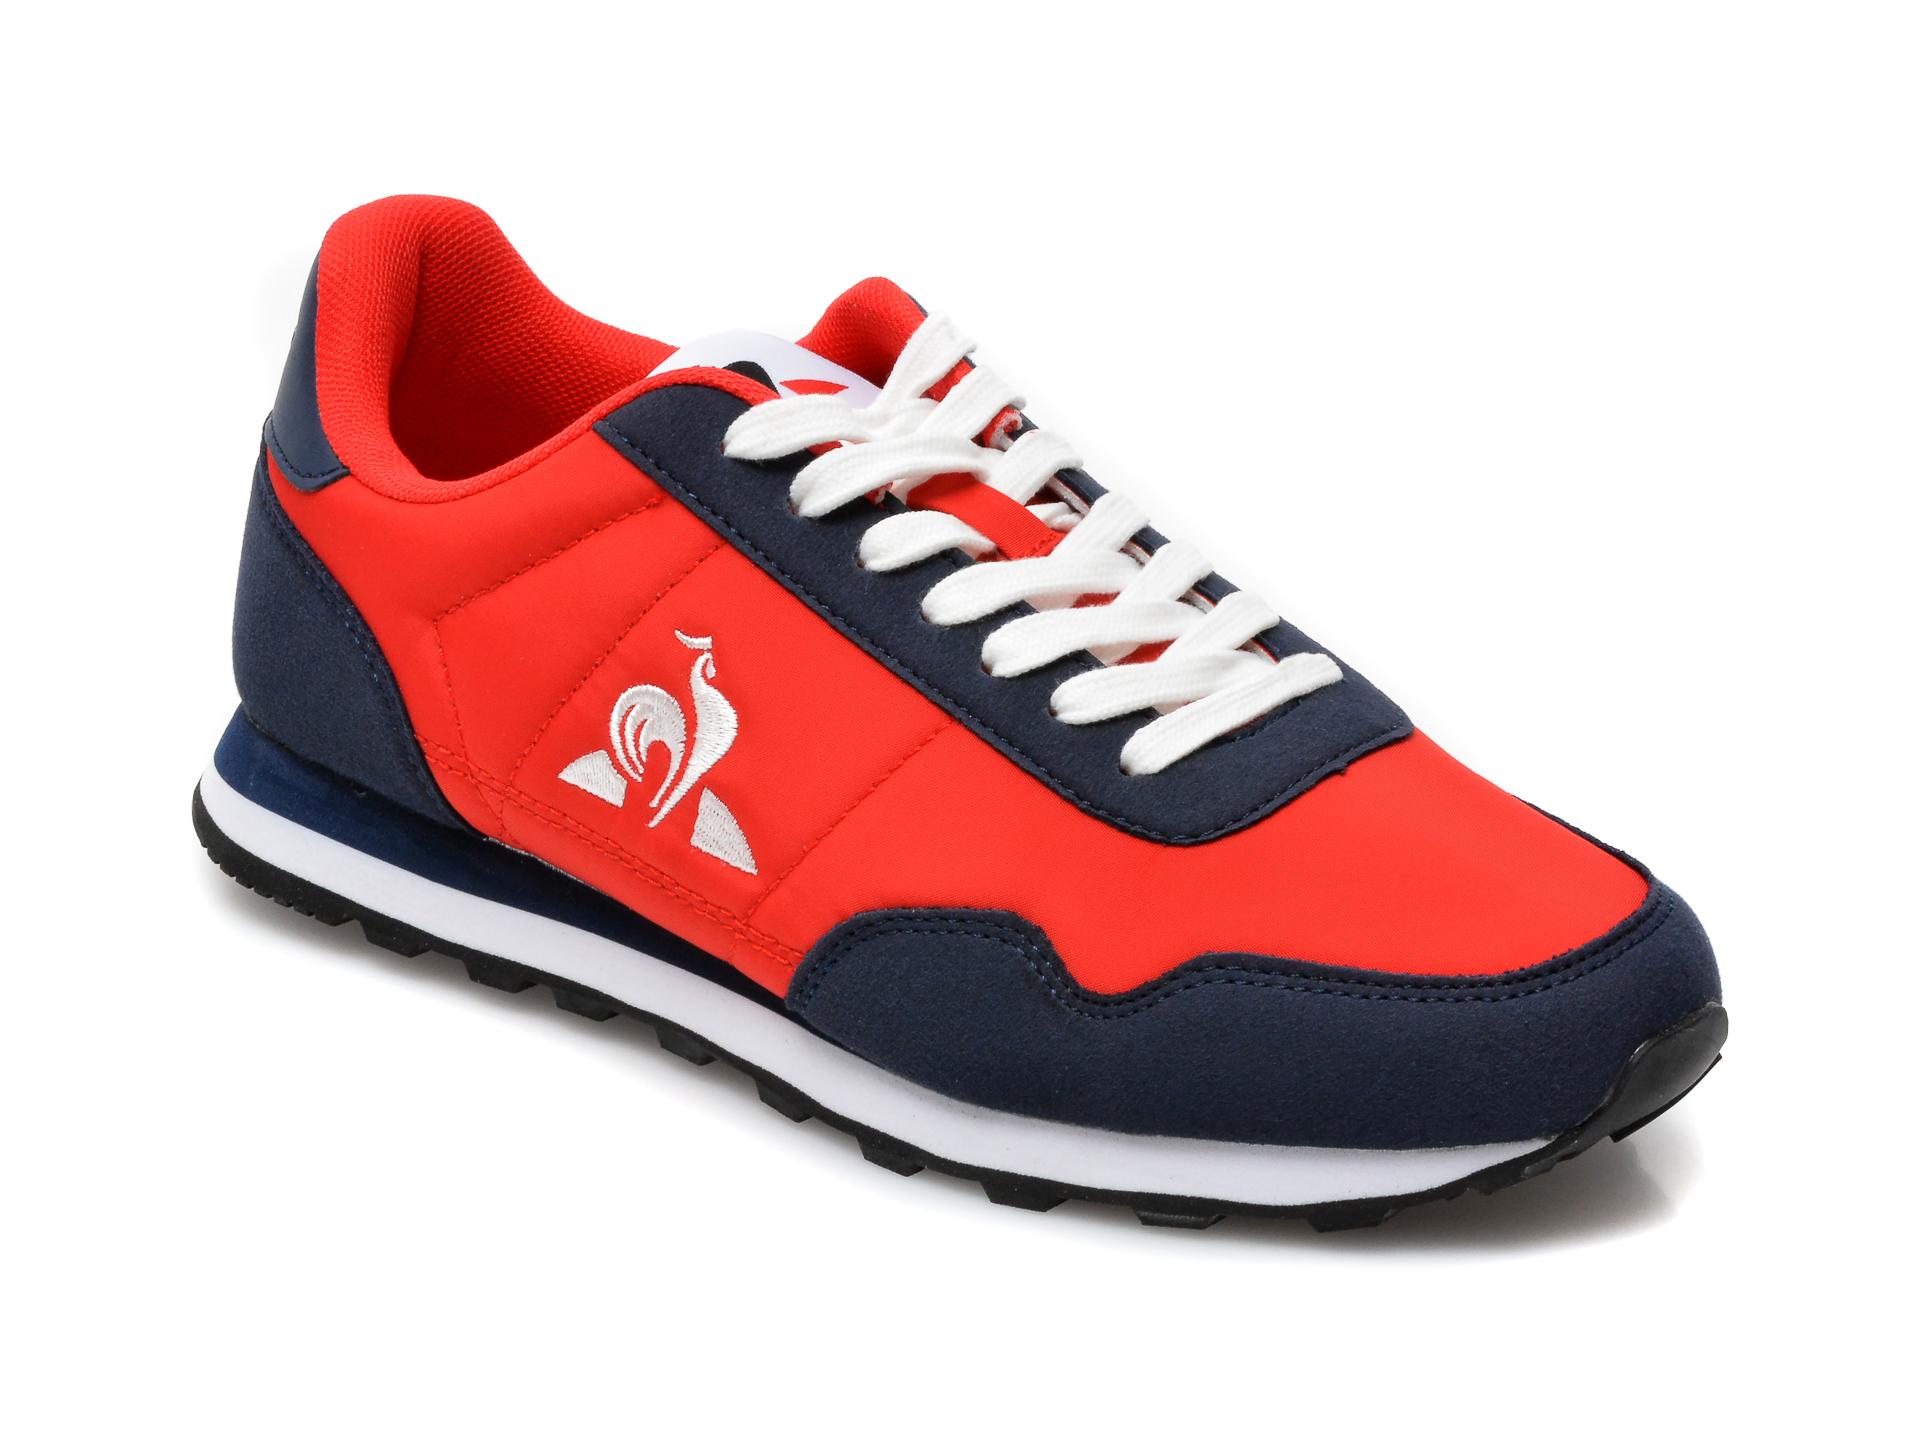 Pantofi sport LE COQ SPORTIF rosii, Astra, din material textil si piele ecologica imagine otter.ro 2021